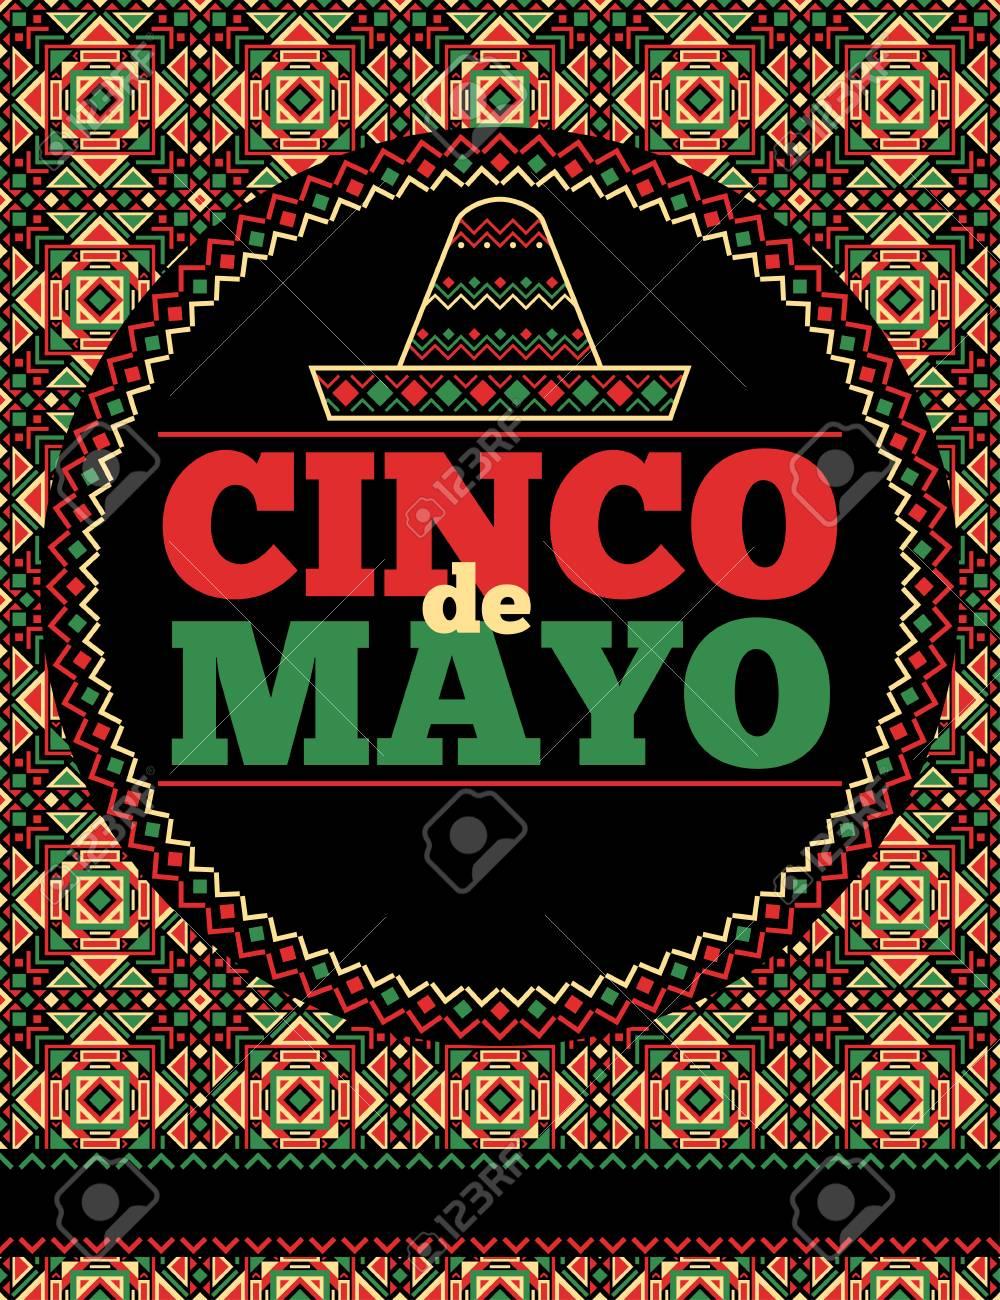 aztec style cinco de mayo flyer template royalty free cliparts